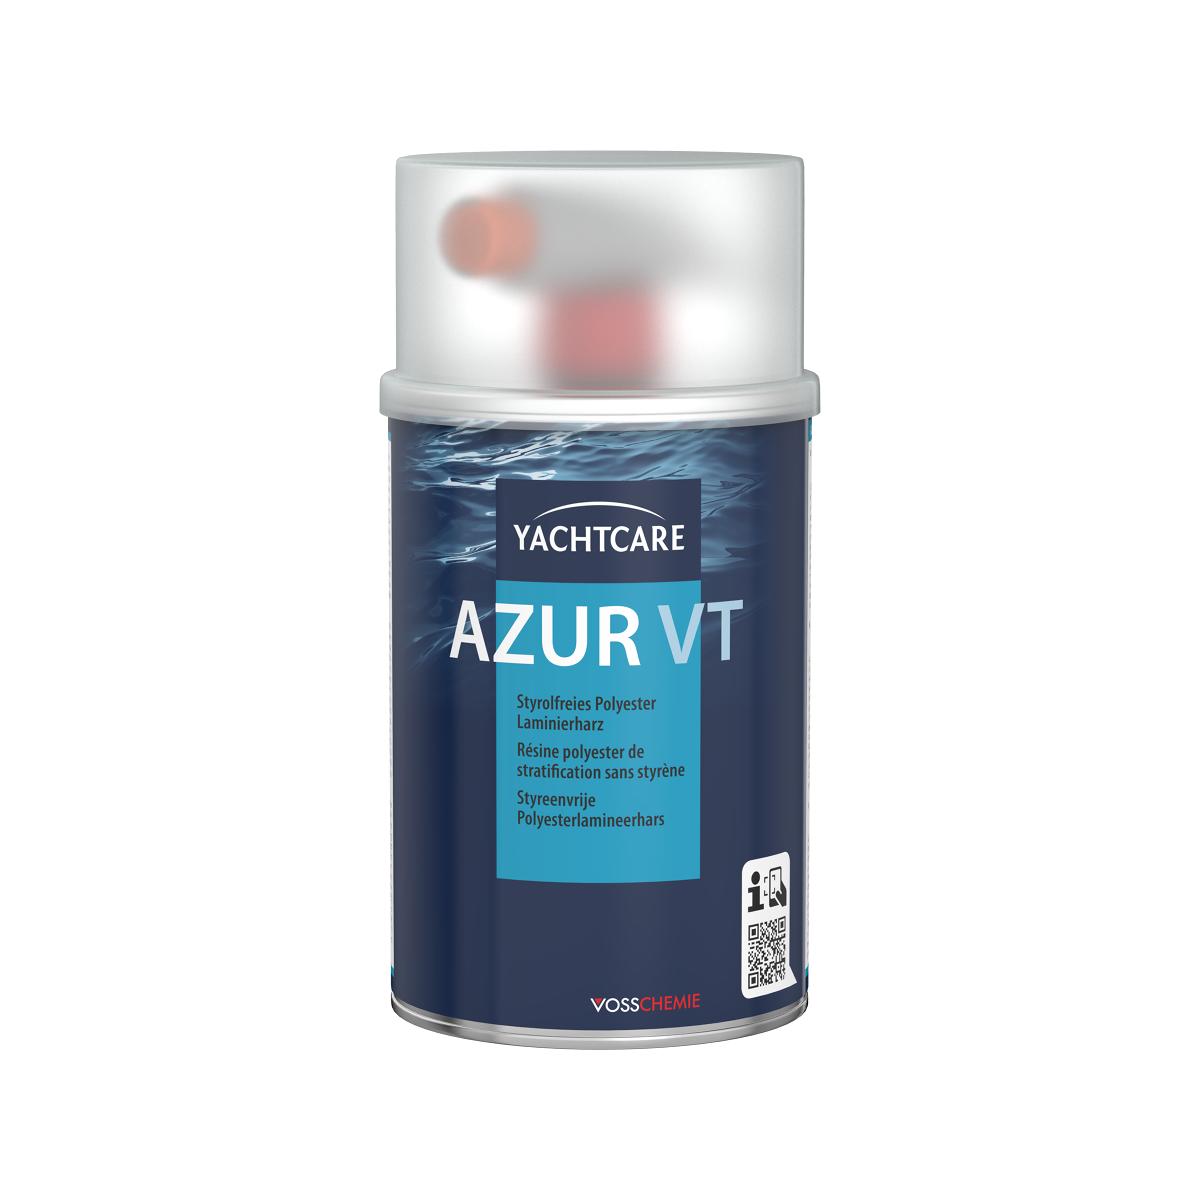 Yachtcare Azur VT polyester lamineerhars incl. verharder - 1kg